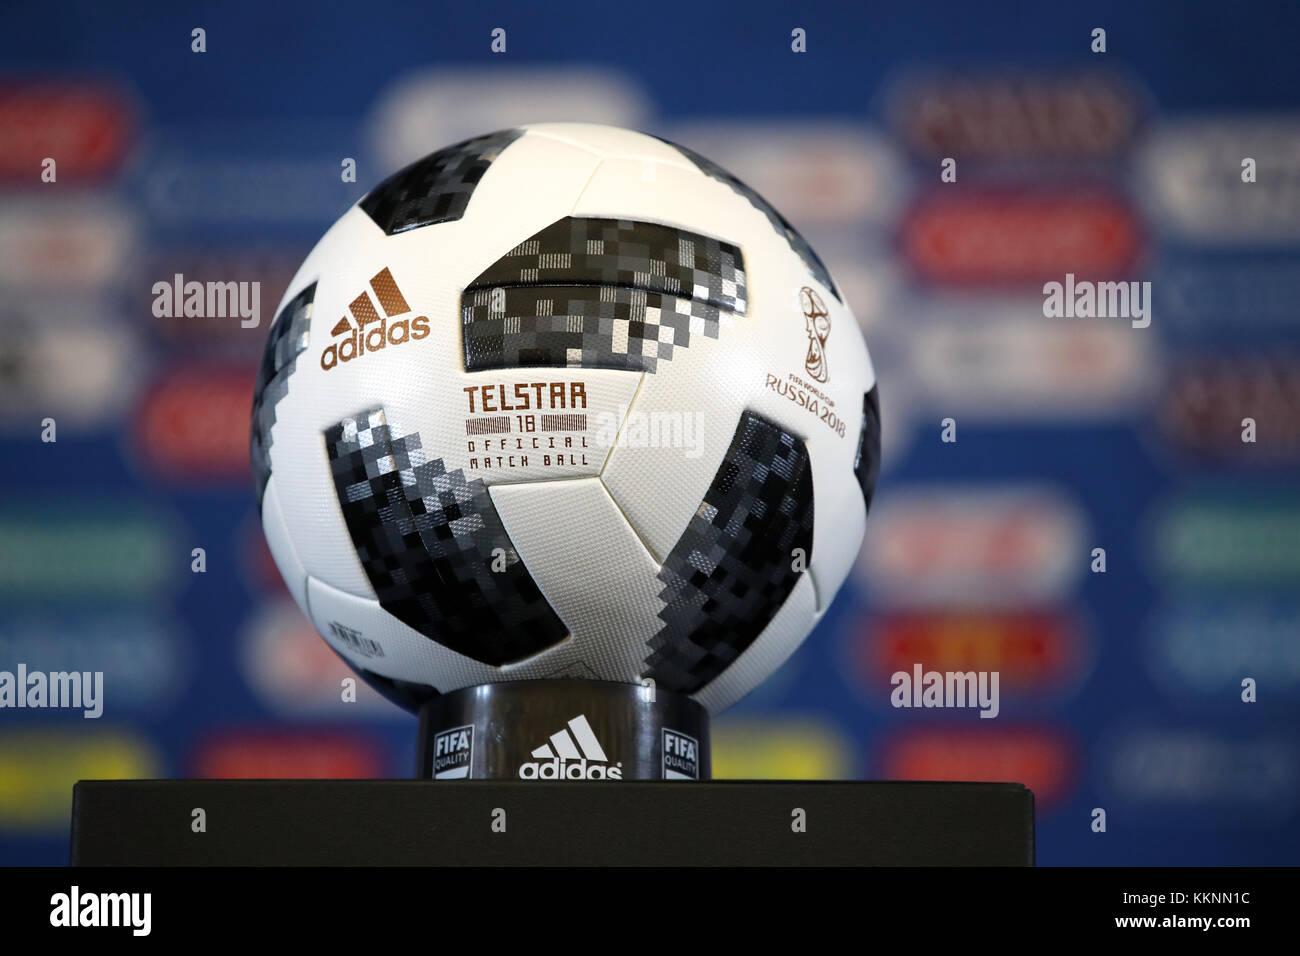 Official Match Ball Imágenes De Stock   Official Match Ball Fotos De ... 5ddf6689dbf9e